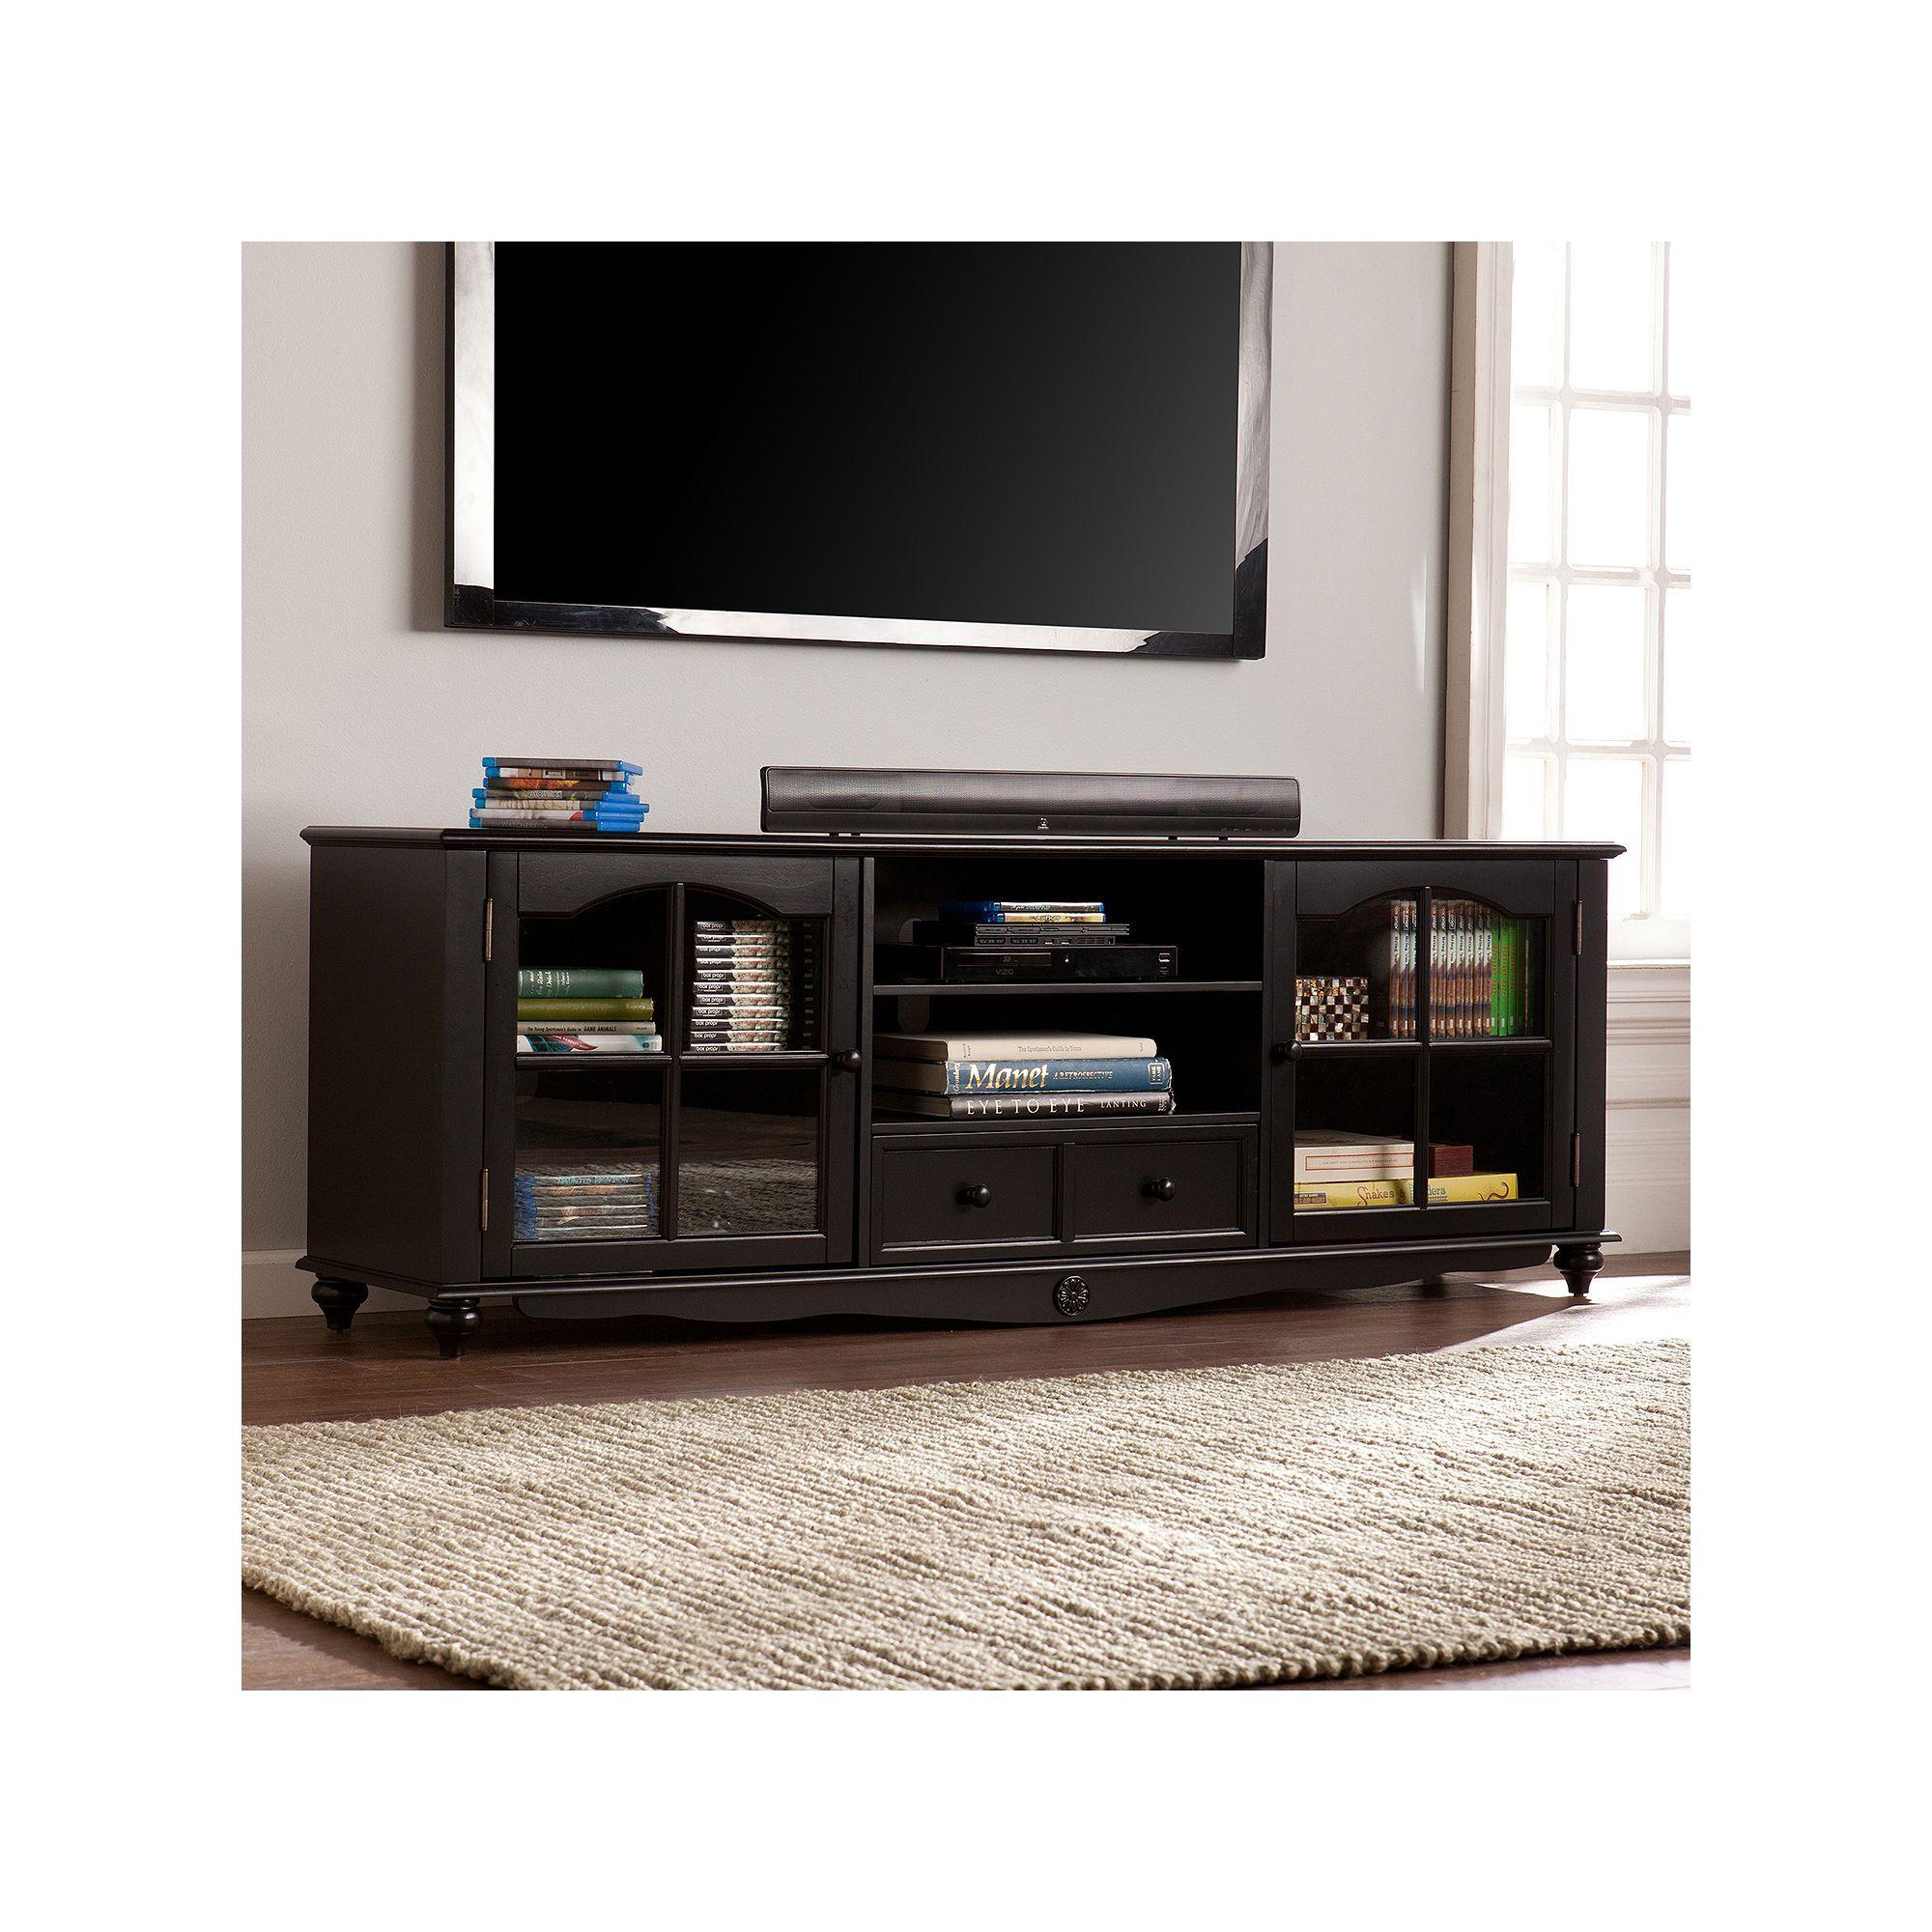 Furniture of America Sloan Industrial 70-inch Wood TV Stand in Vintage Walnut